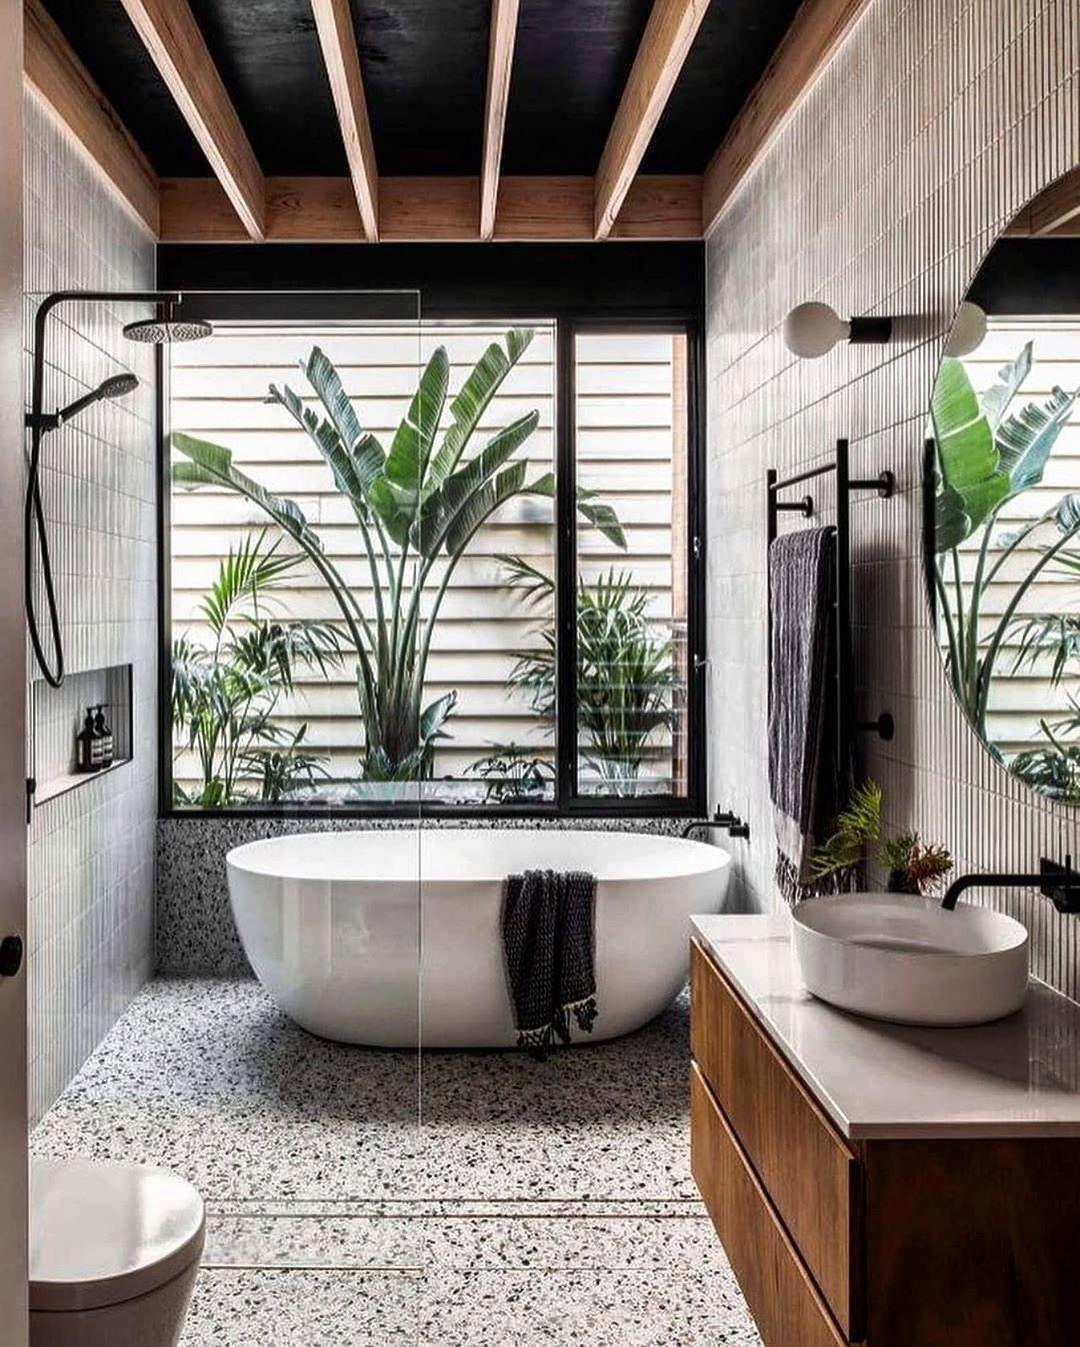 11 Fantastic Small Bathroom Organizing Ideas See How You Can Maximize Your Bathroom Storage Bathroom Shelving Small Bathroom Bathroom Makeover Bathroom Decor